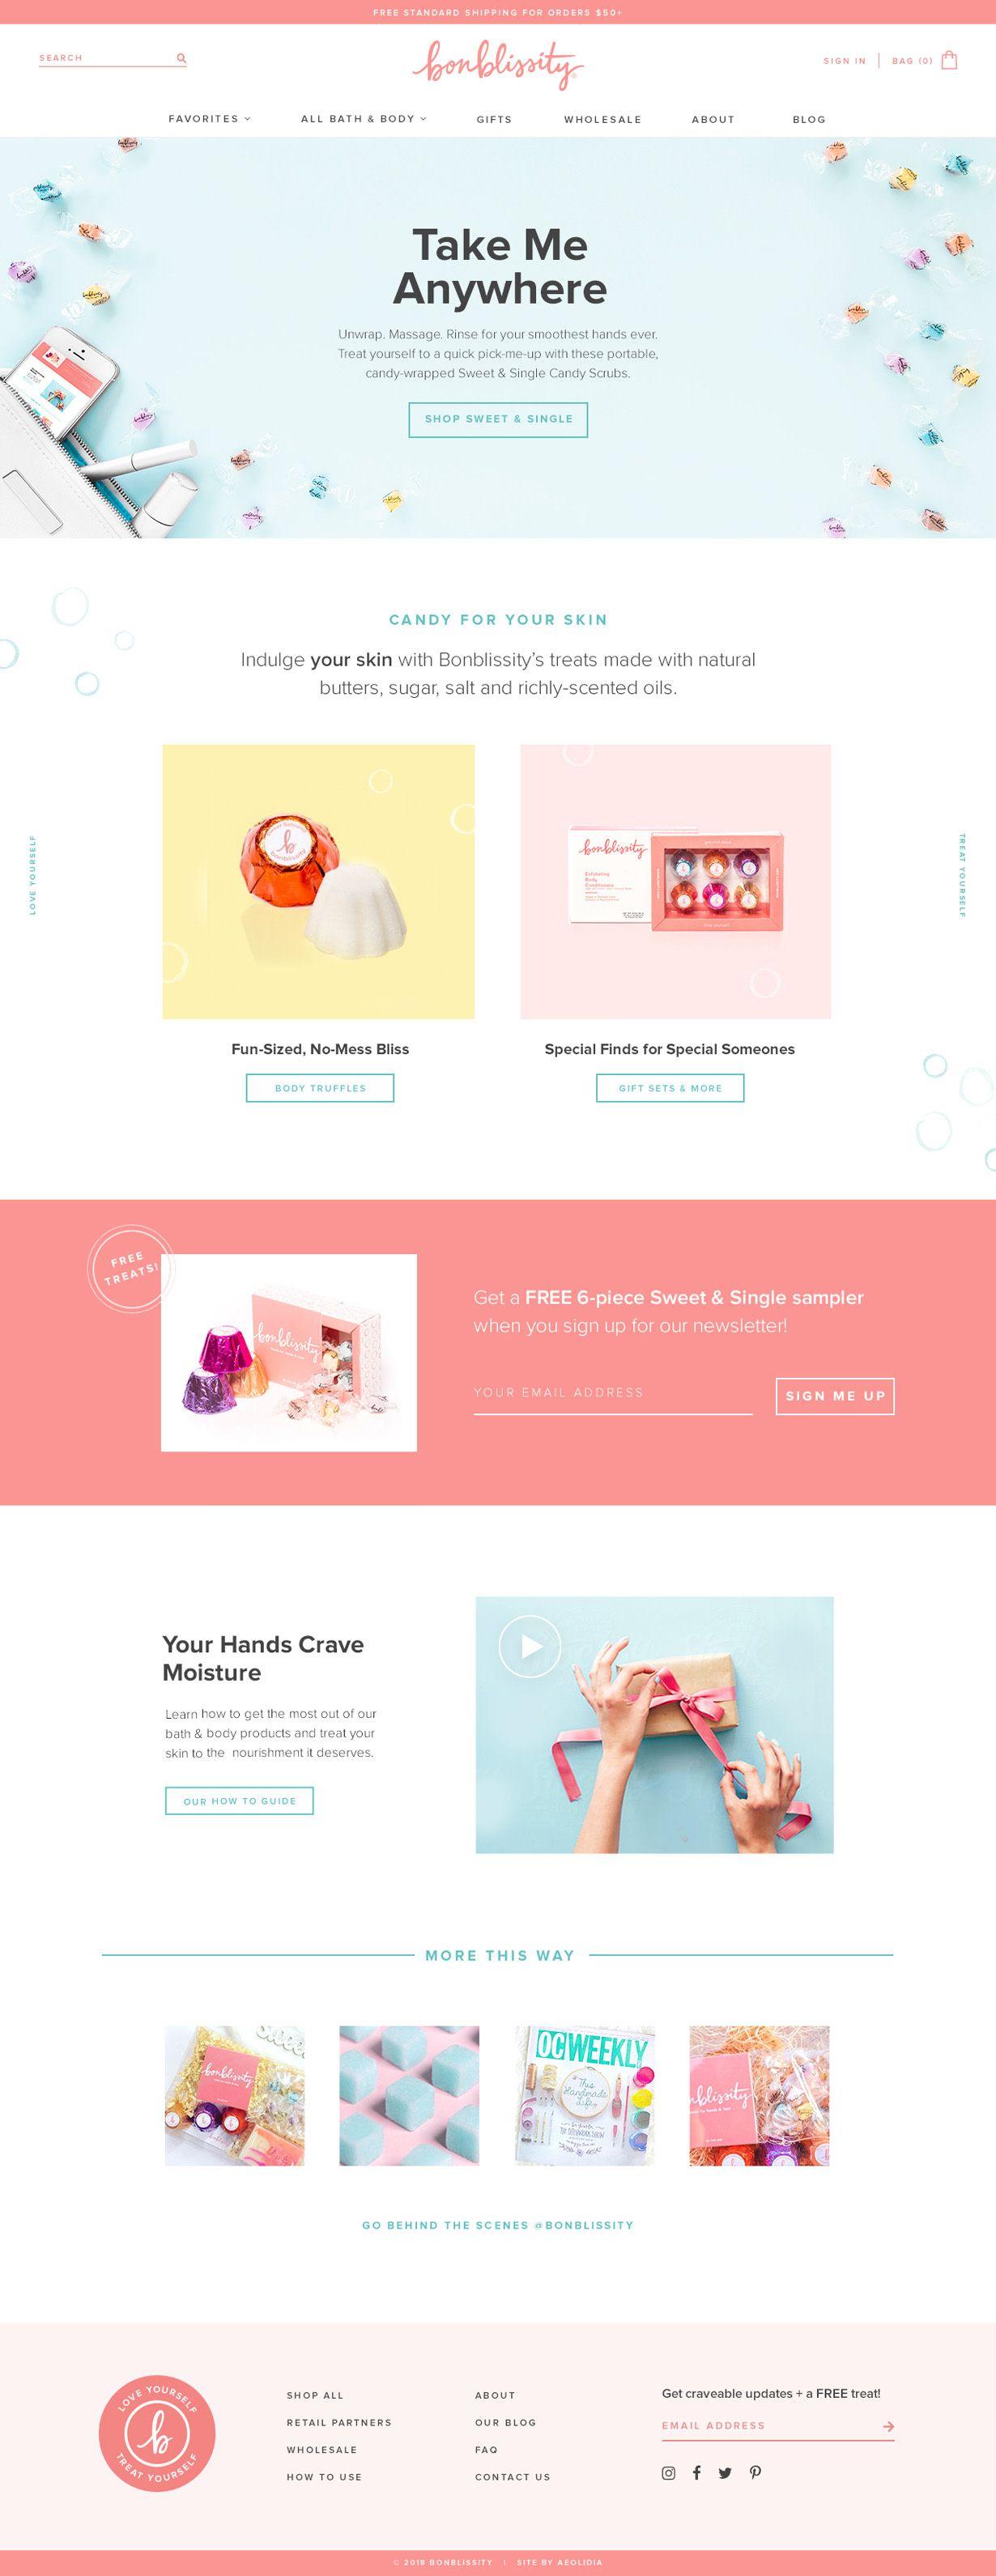 Bonblissity Shopify website design by Aeolidia. Looks nice. Website, newsletter...